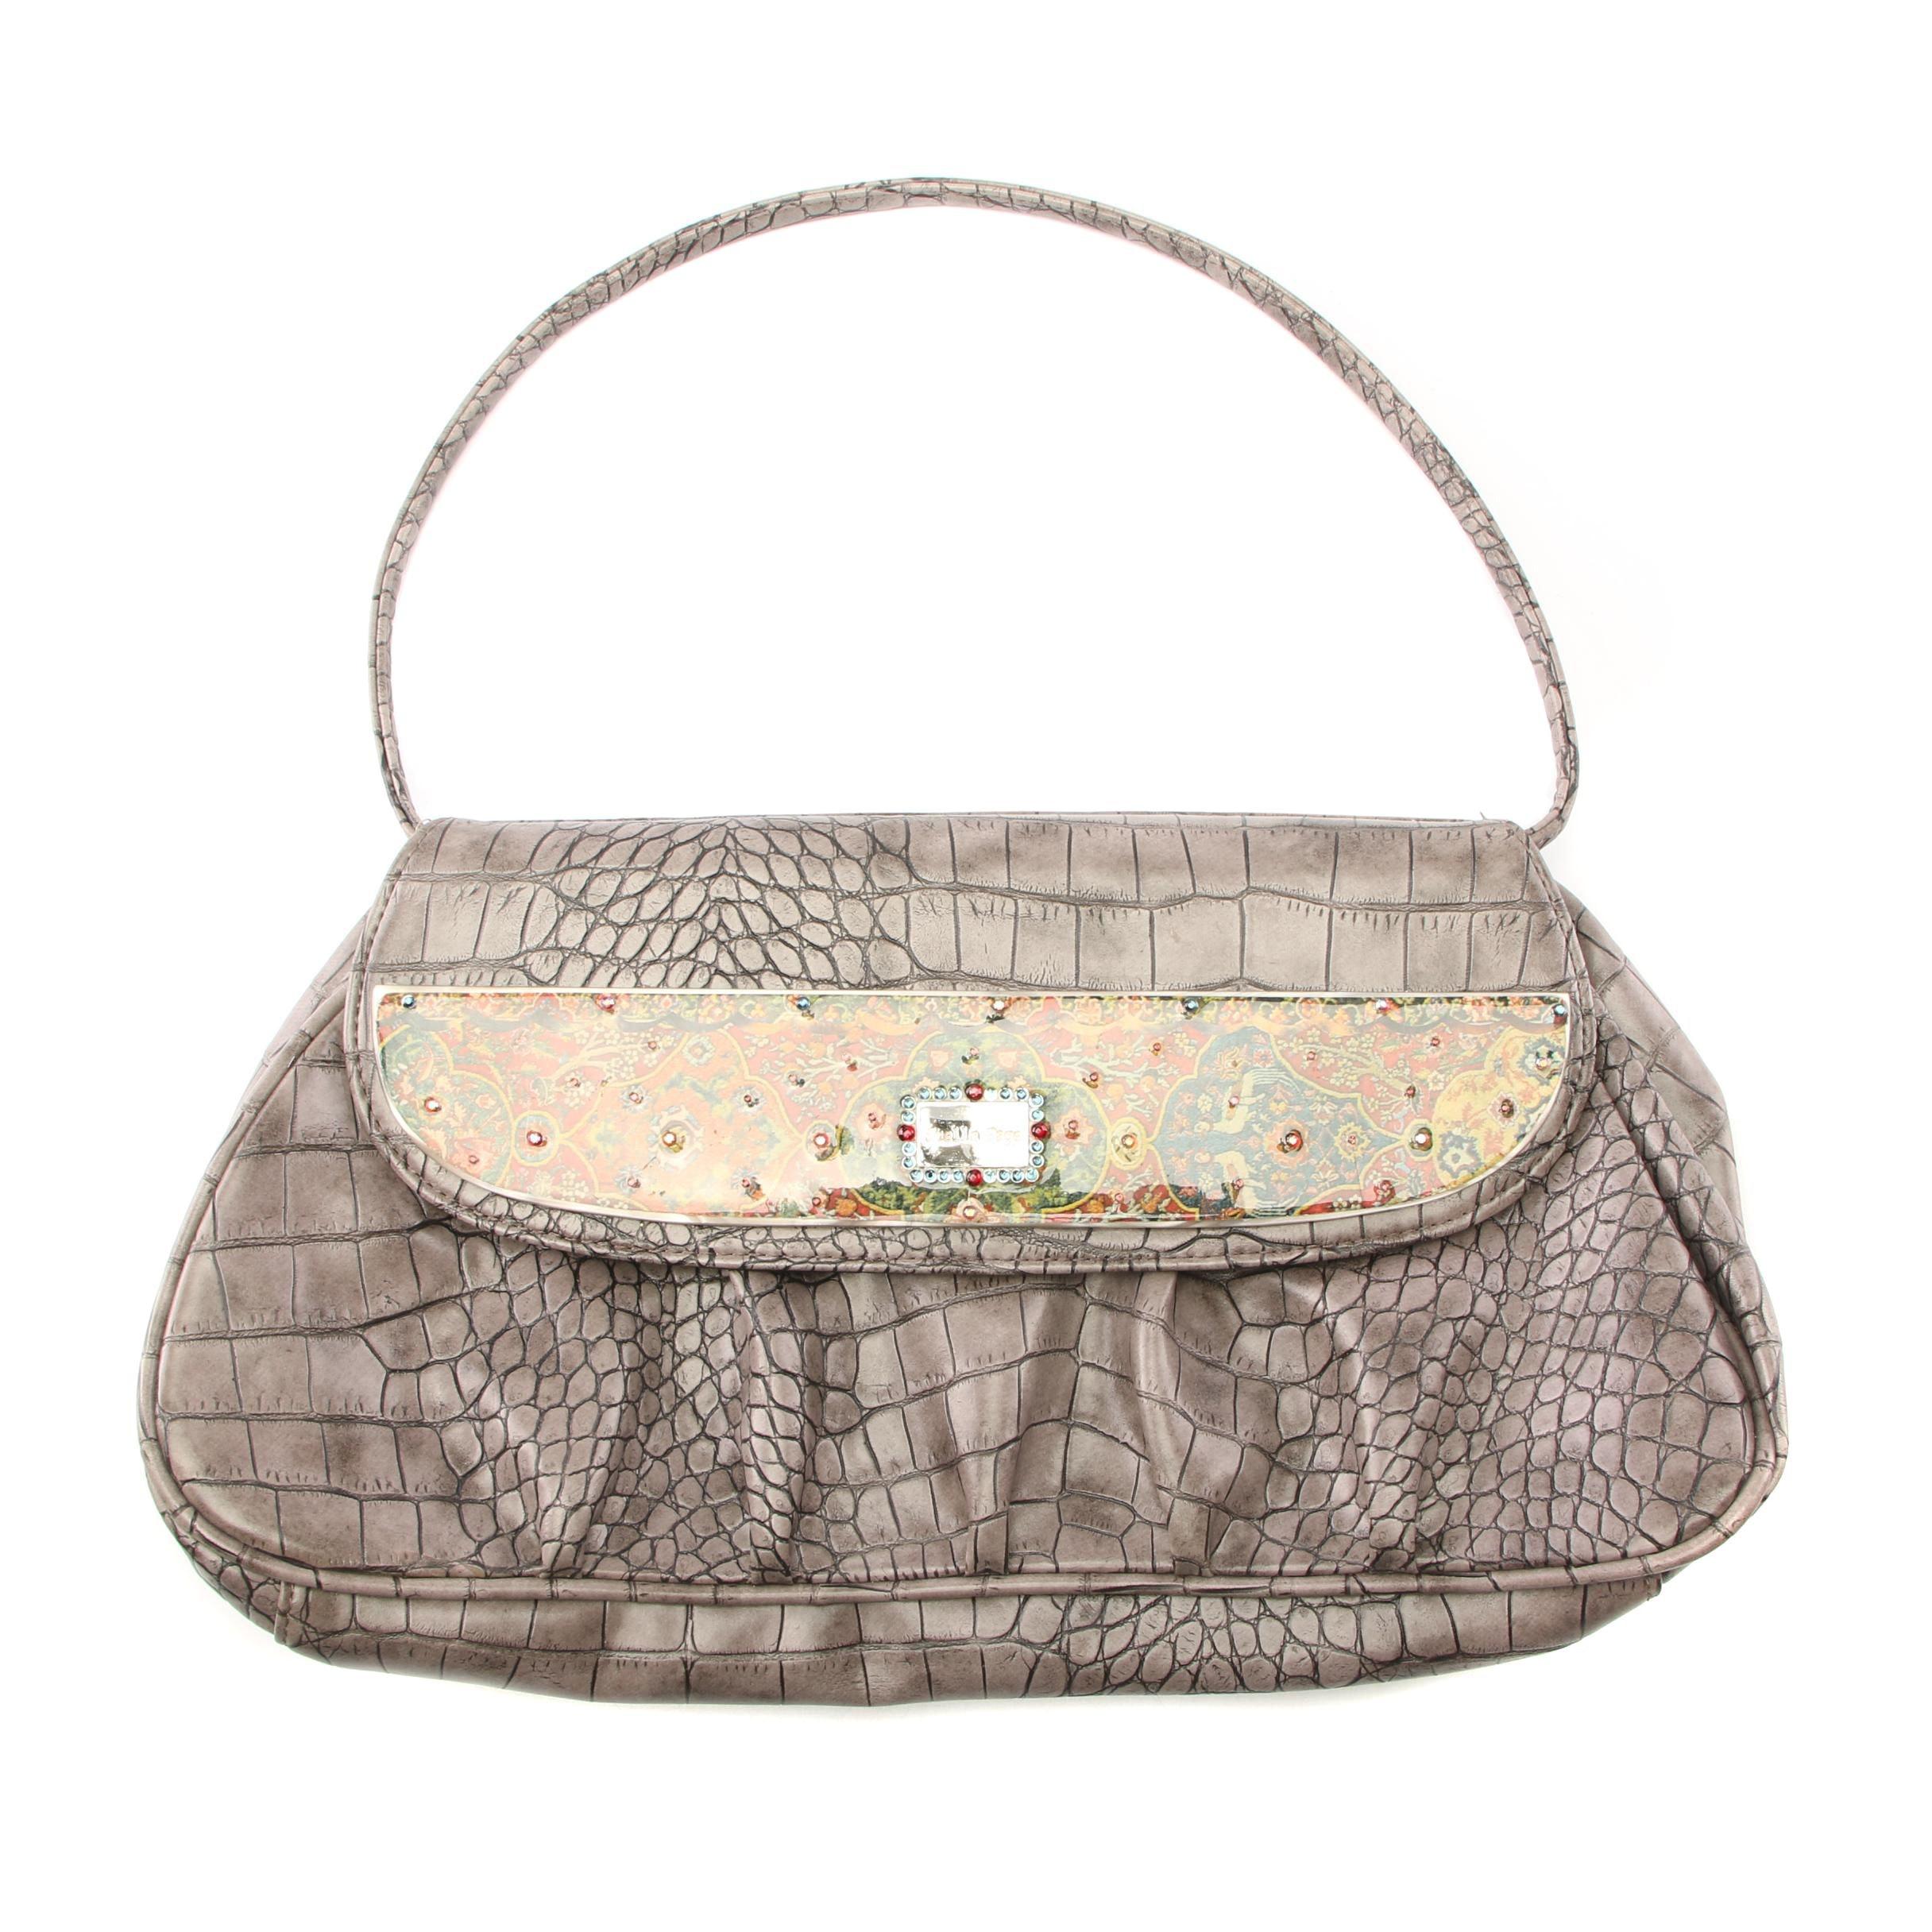 Stella Page Embossed Leather Limited Edition Handbag